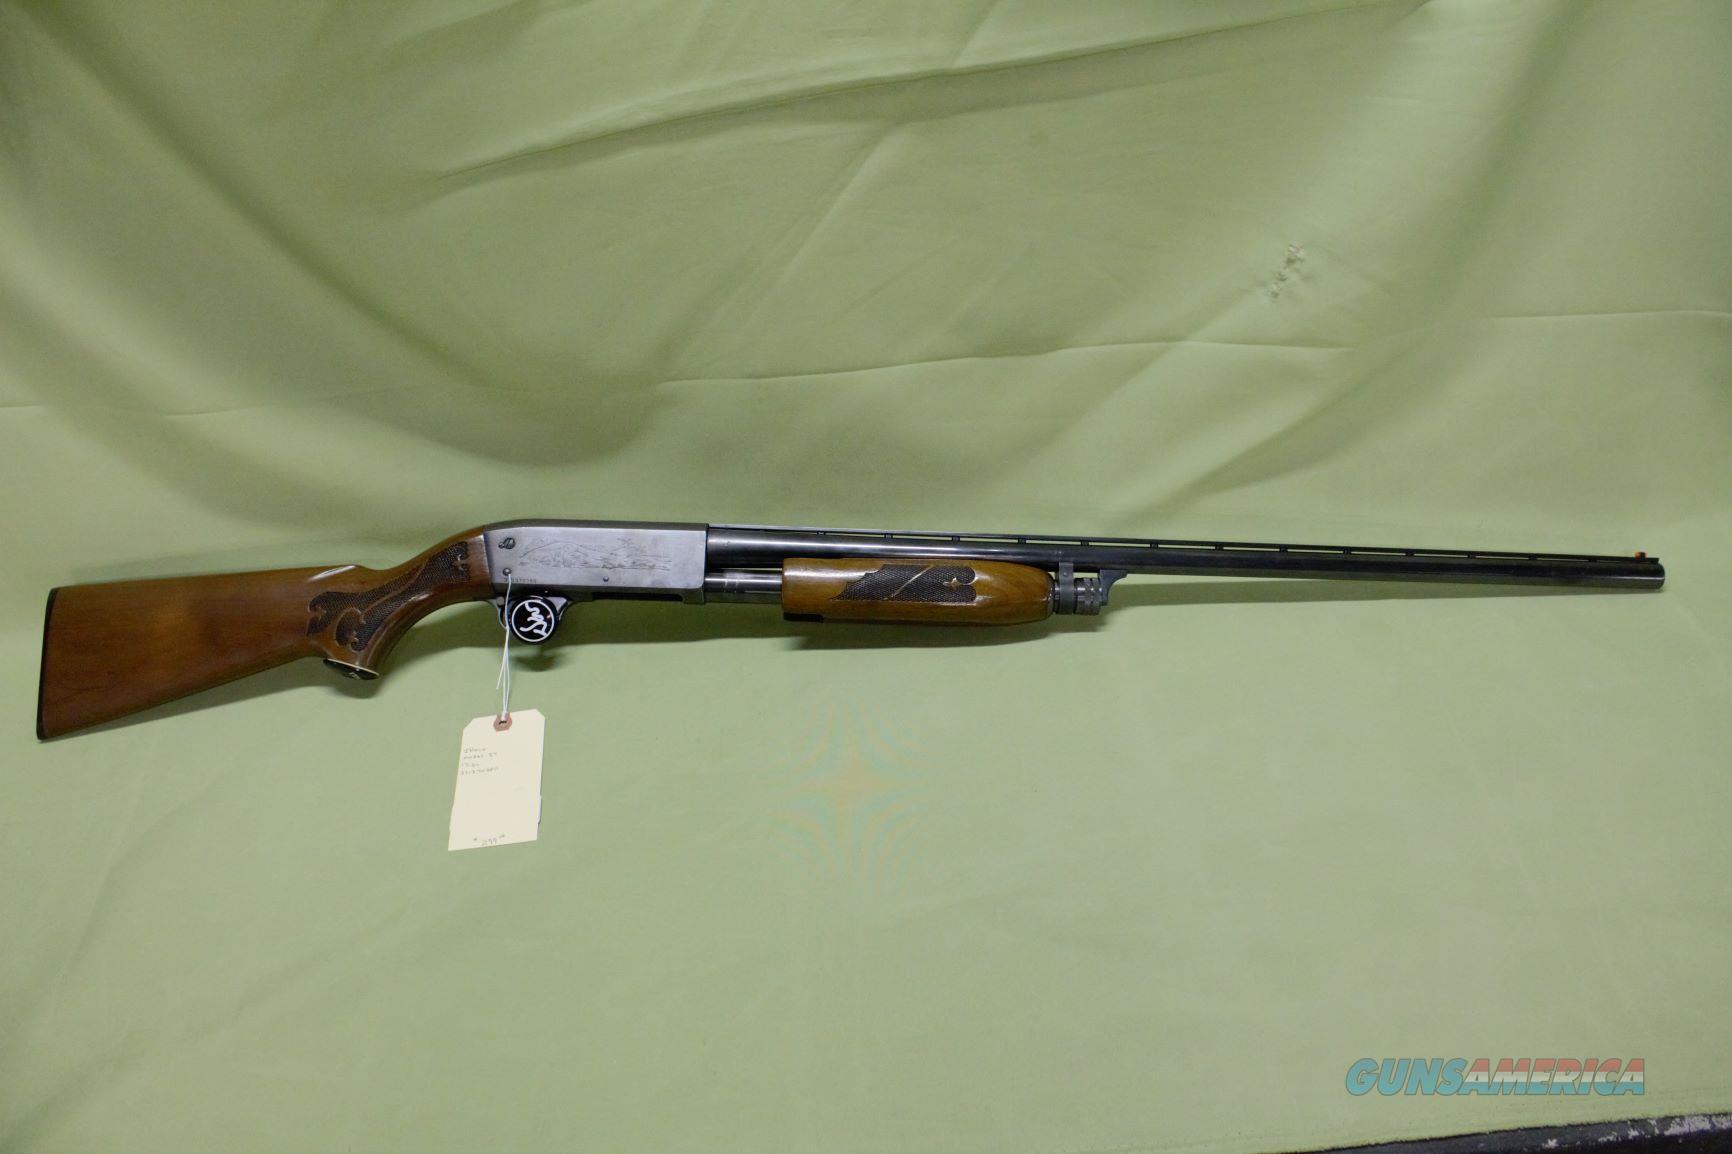 Ithaca Model 37 12 Gauge  Guns > Shotguns > Ithaca Shotguns > Pump